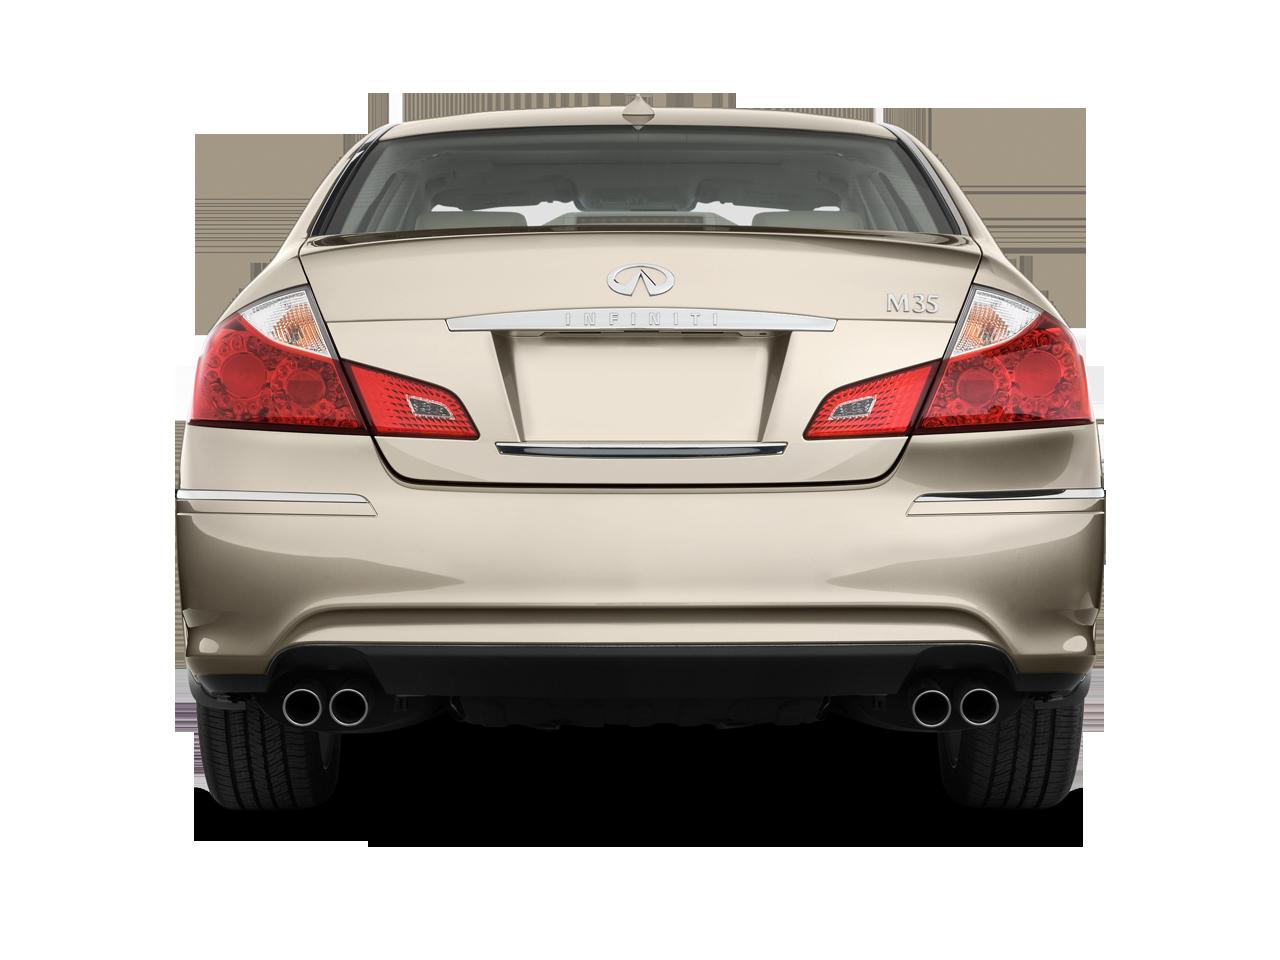 2009 Infiniti M - M35, M35x, M45, M45x, Midsize Sedans ...